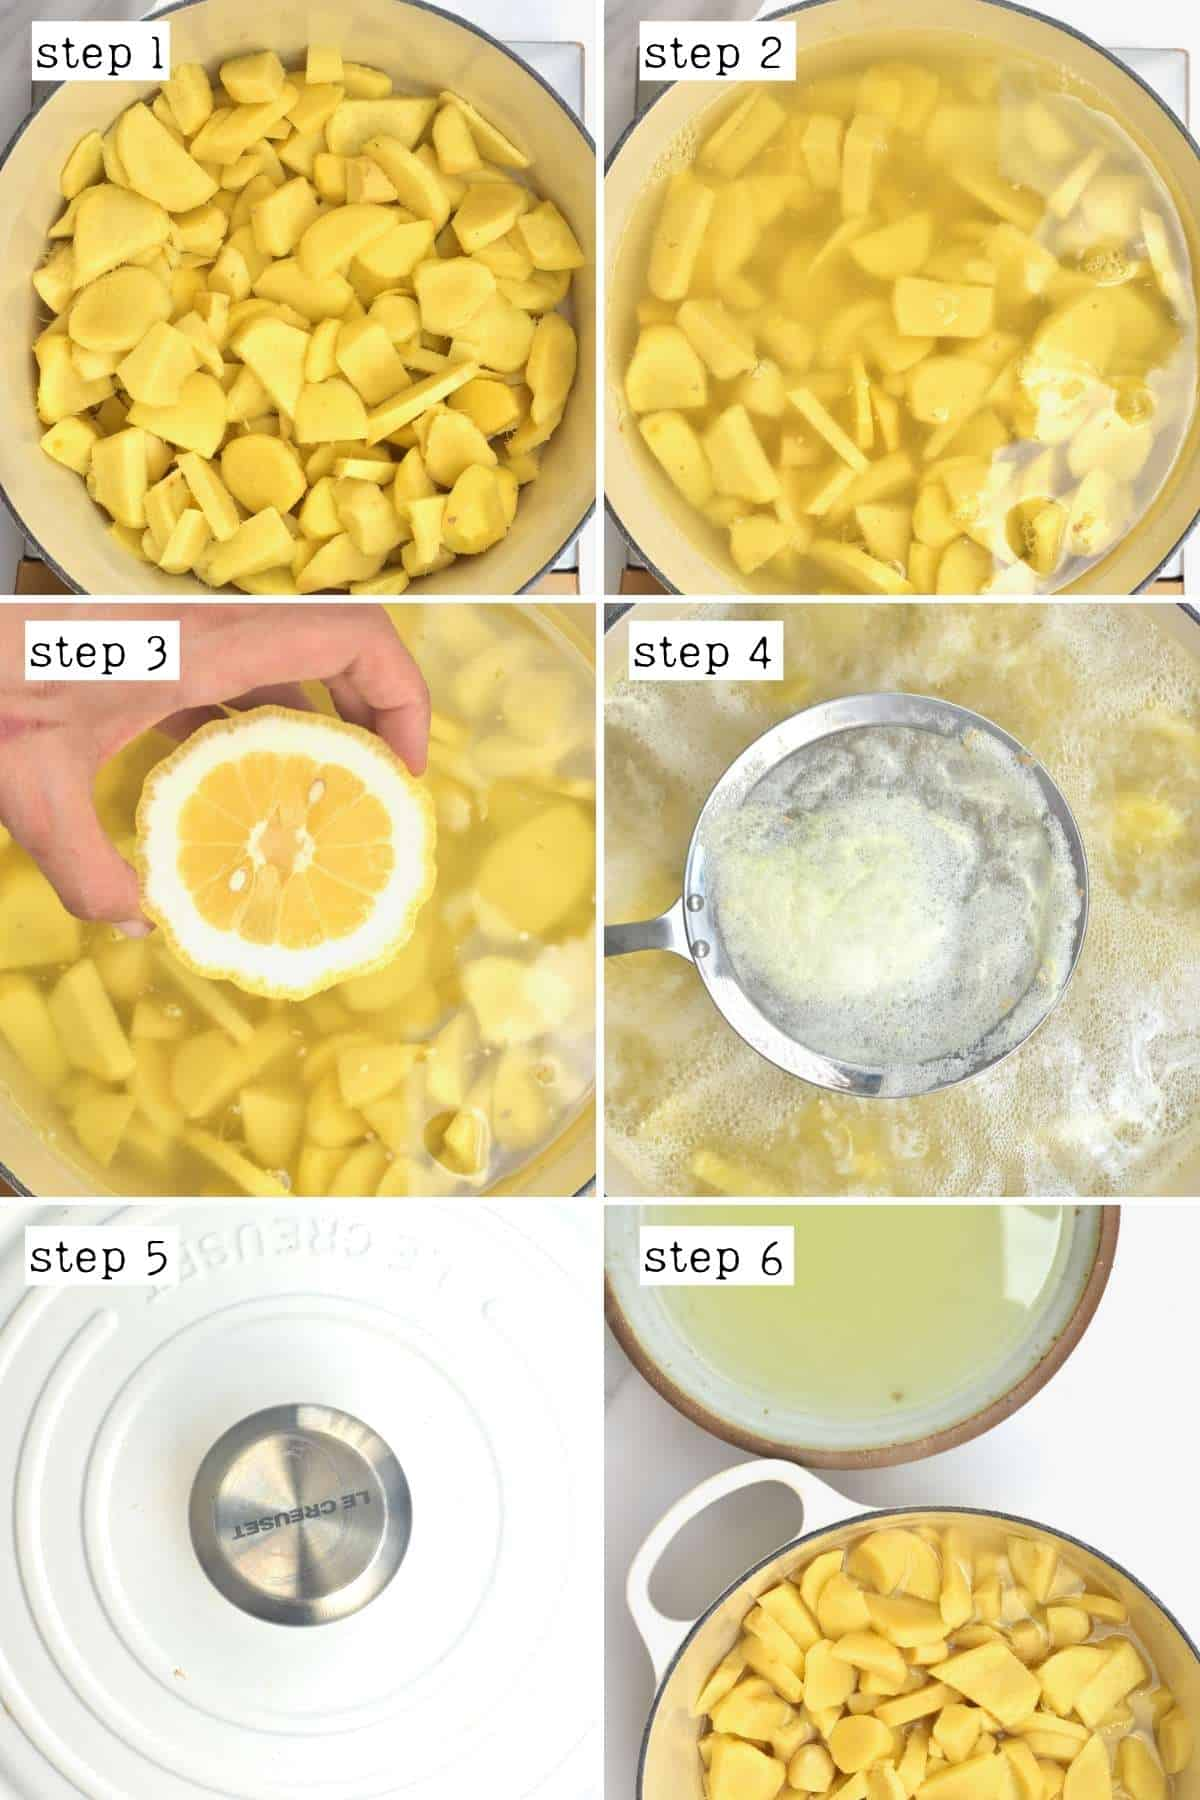 Steps for cooking ginger